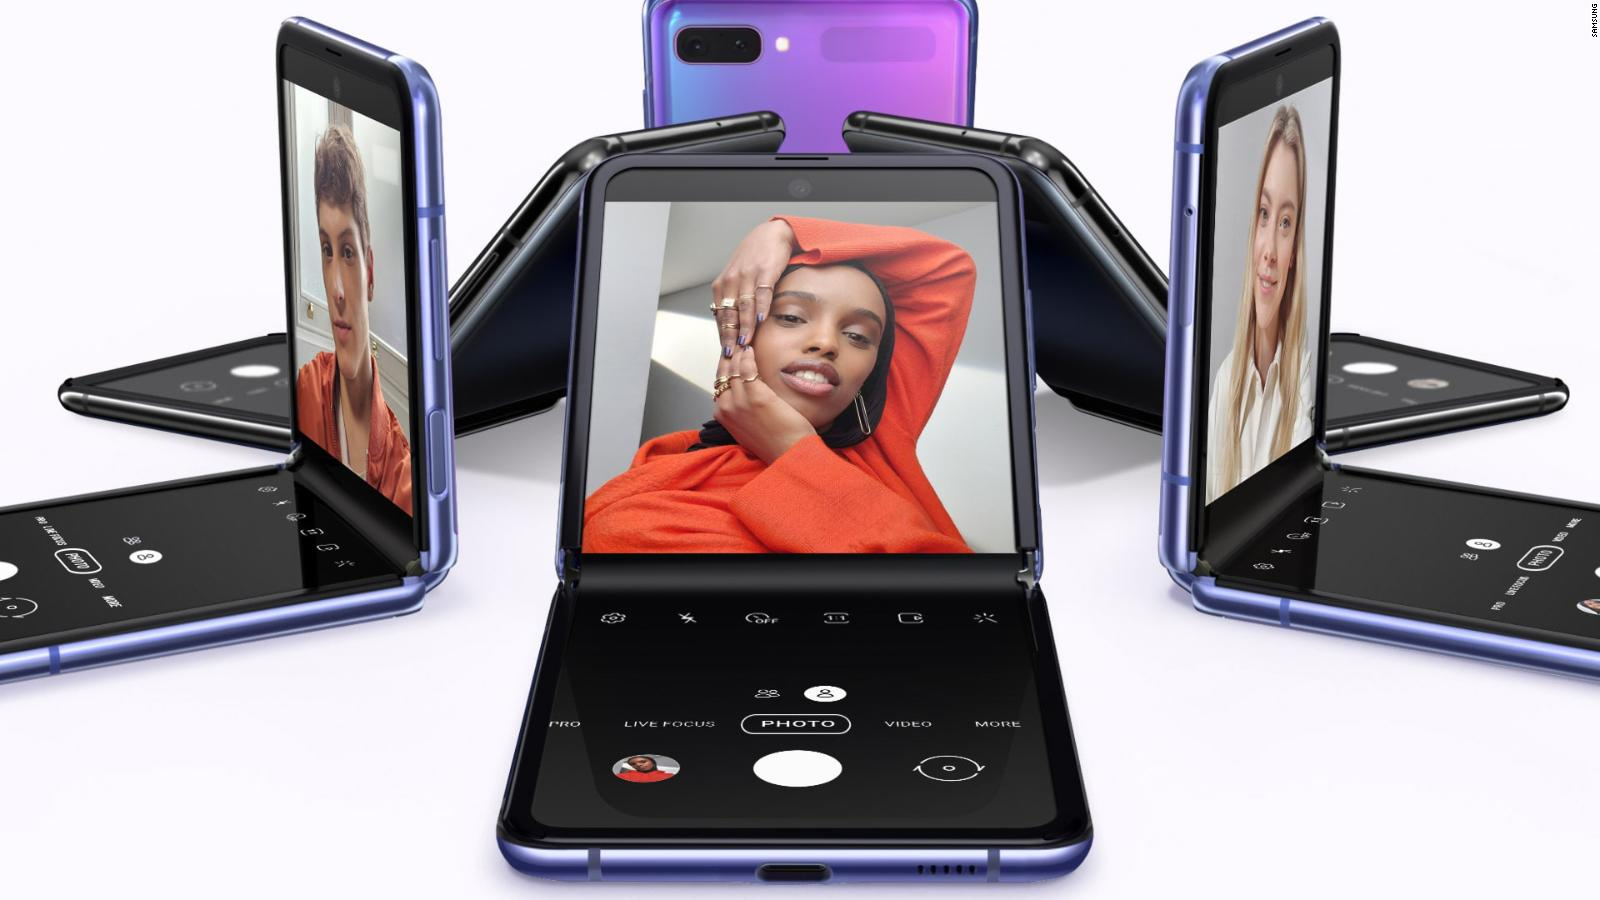 See Samsung S Foldable Galaxy Z Flip Smartphone Cnn Video